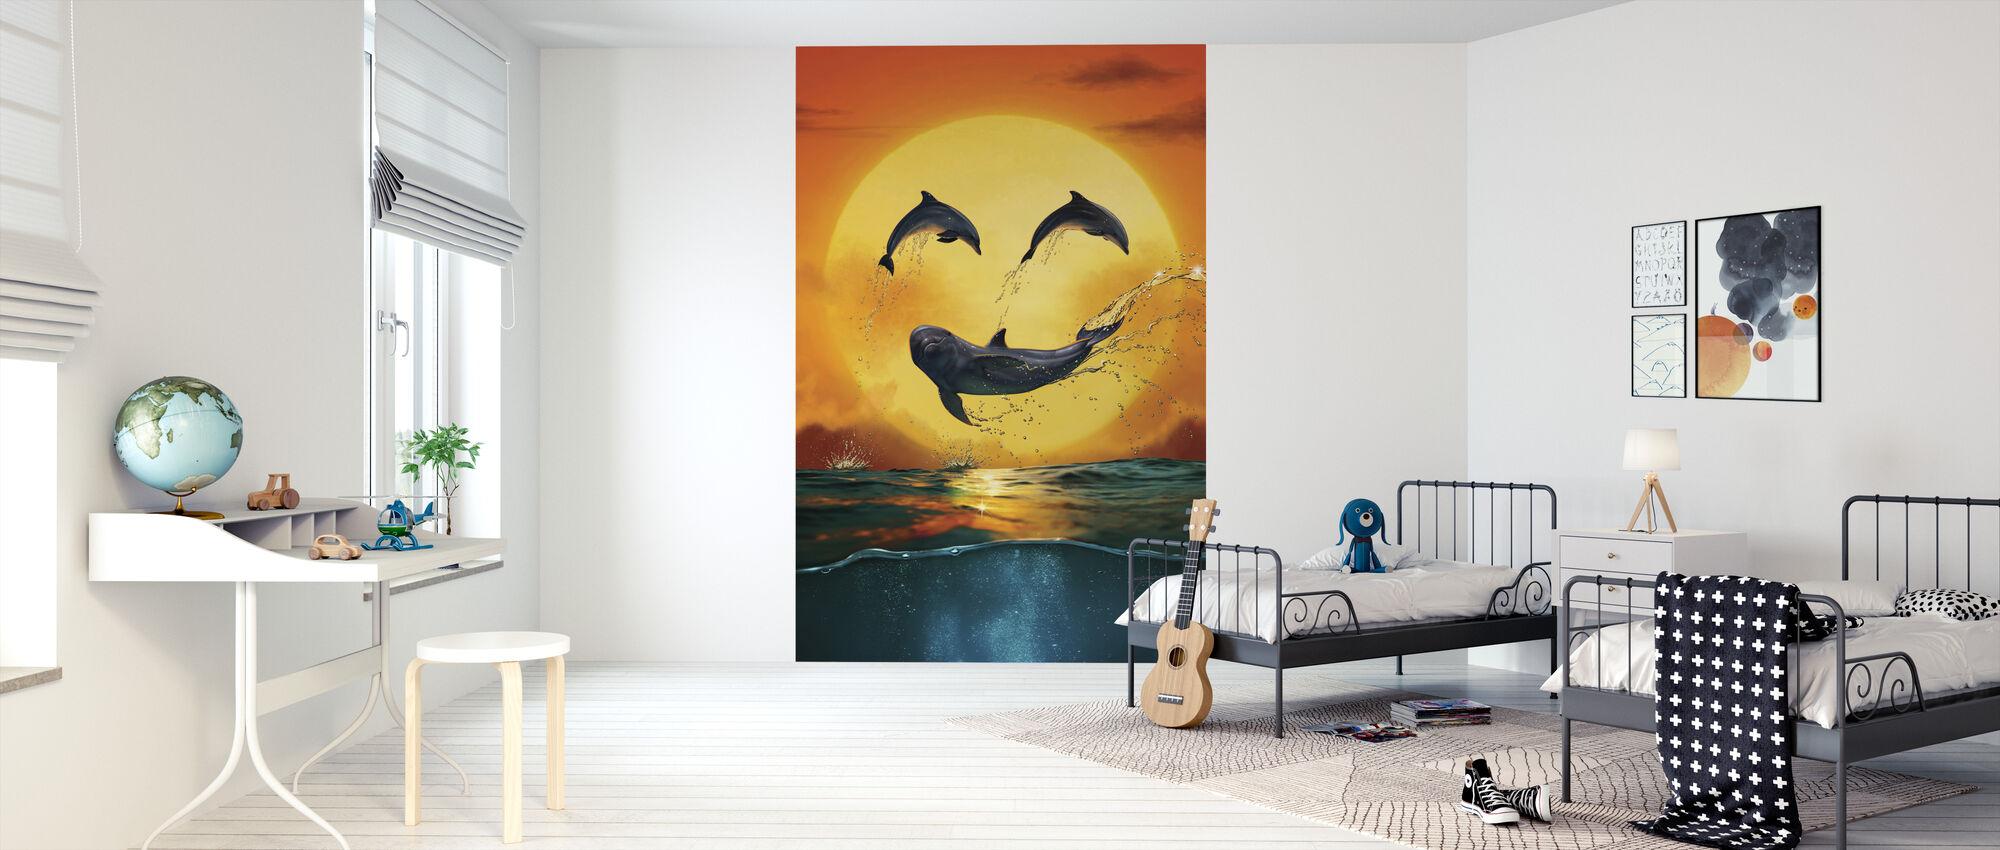 Dolphin Emoji Smily - Wallpaper - Kids Room